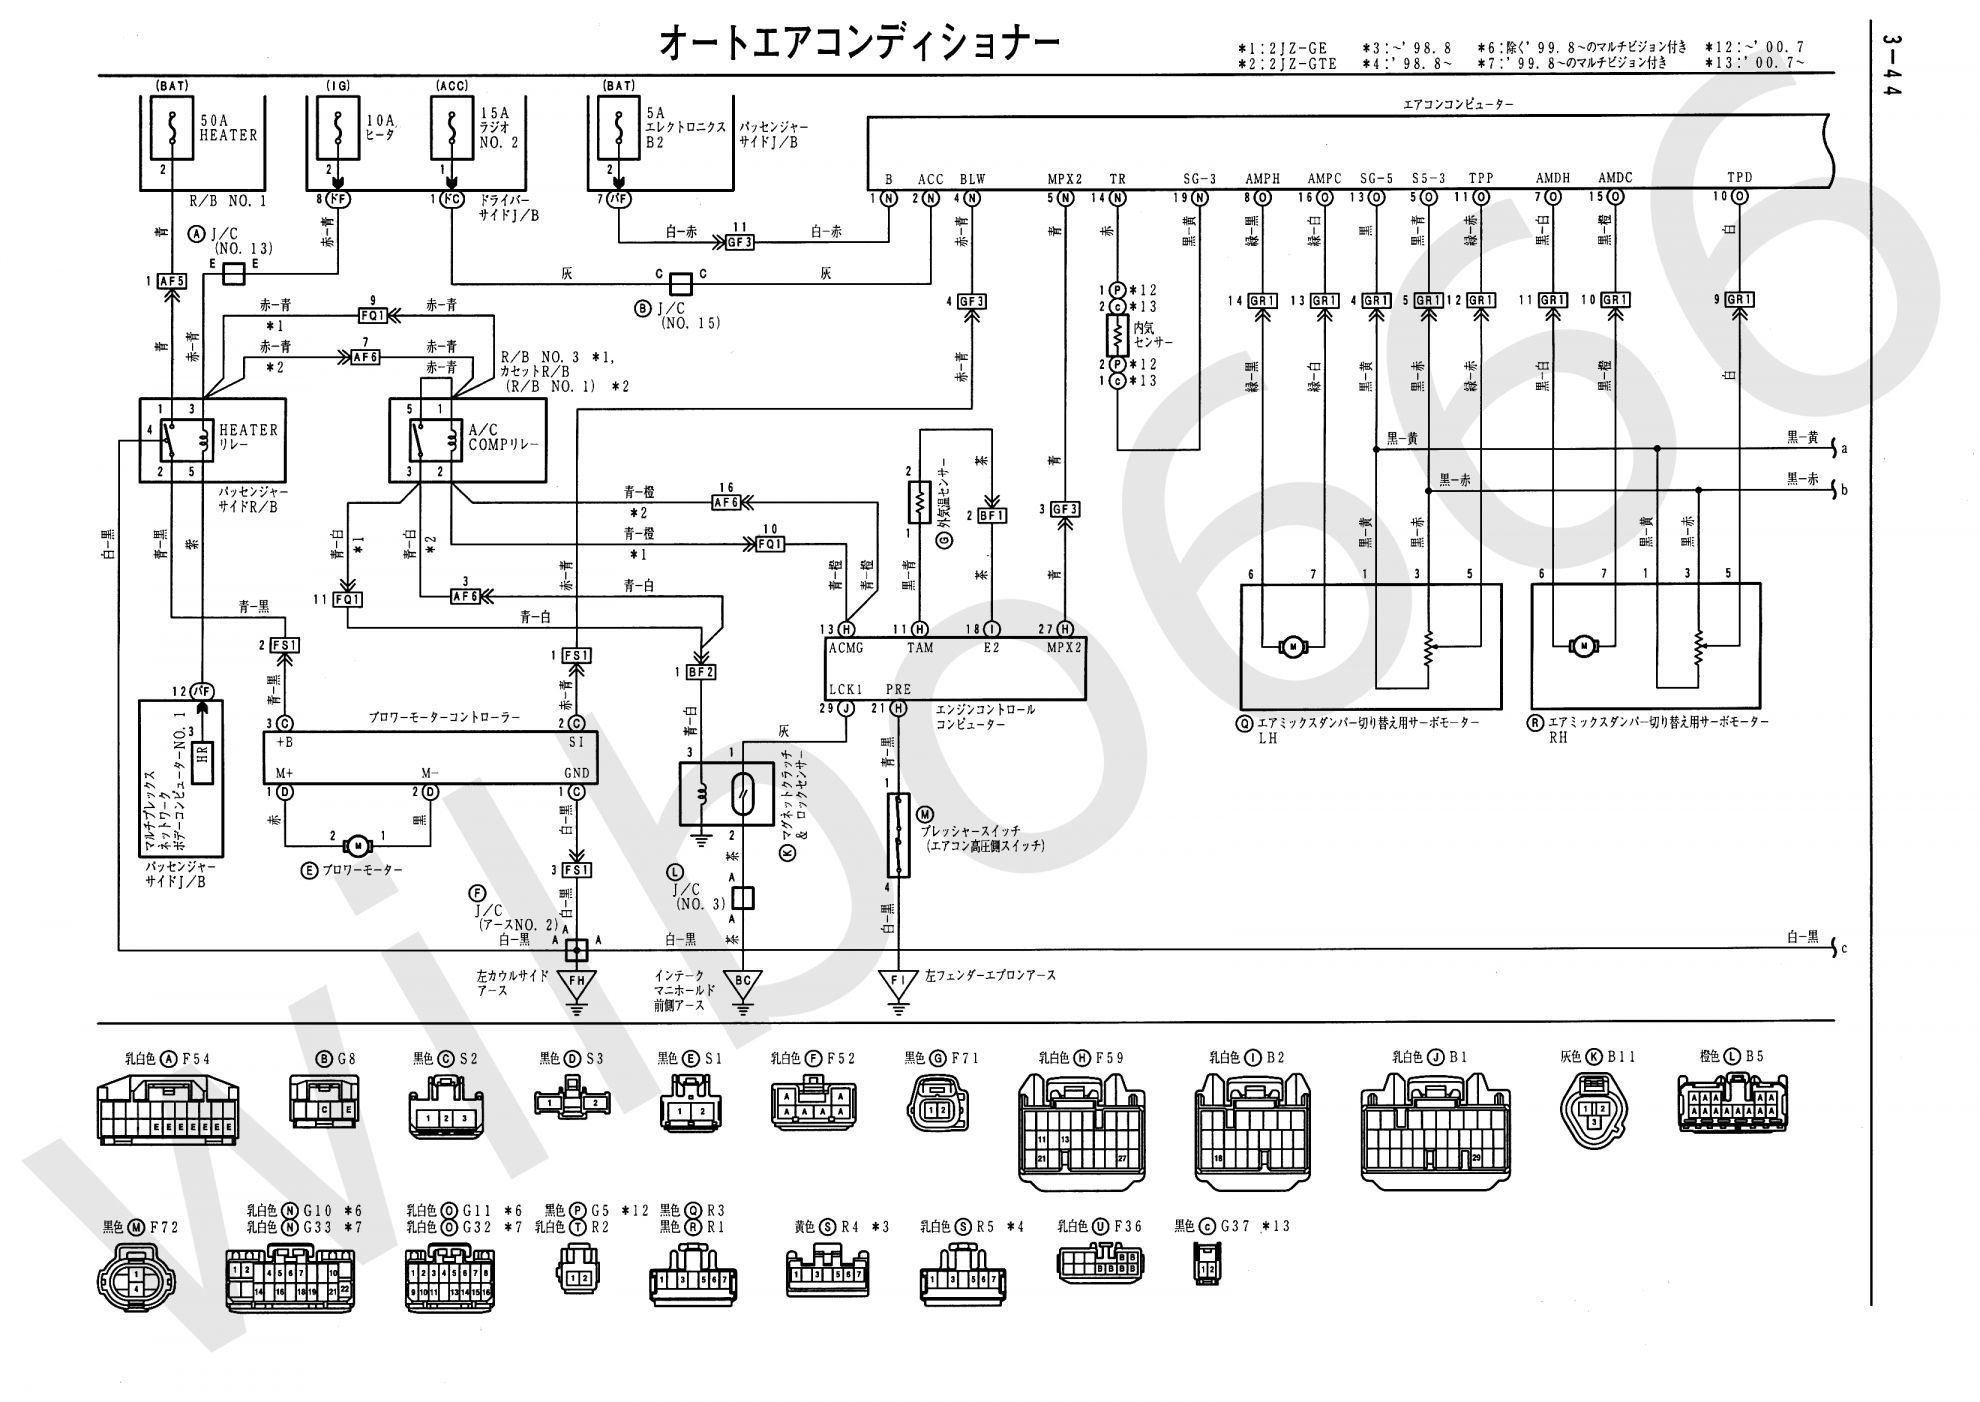 1973 Vw Super Beetle Engine Wiring Diagram Schematic And Wiring Diagram Vw Super Beetle Diagram Engineering